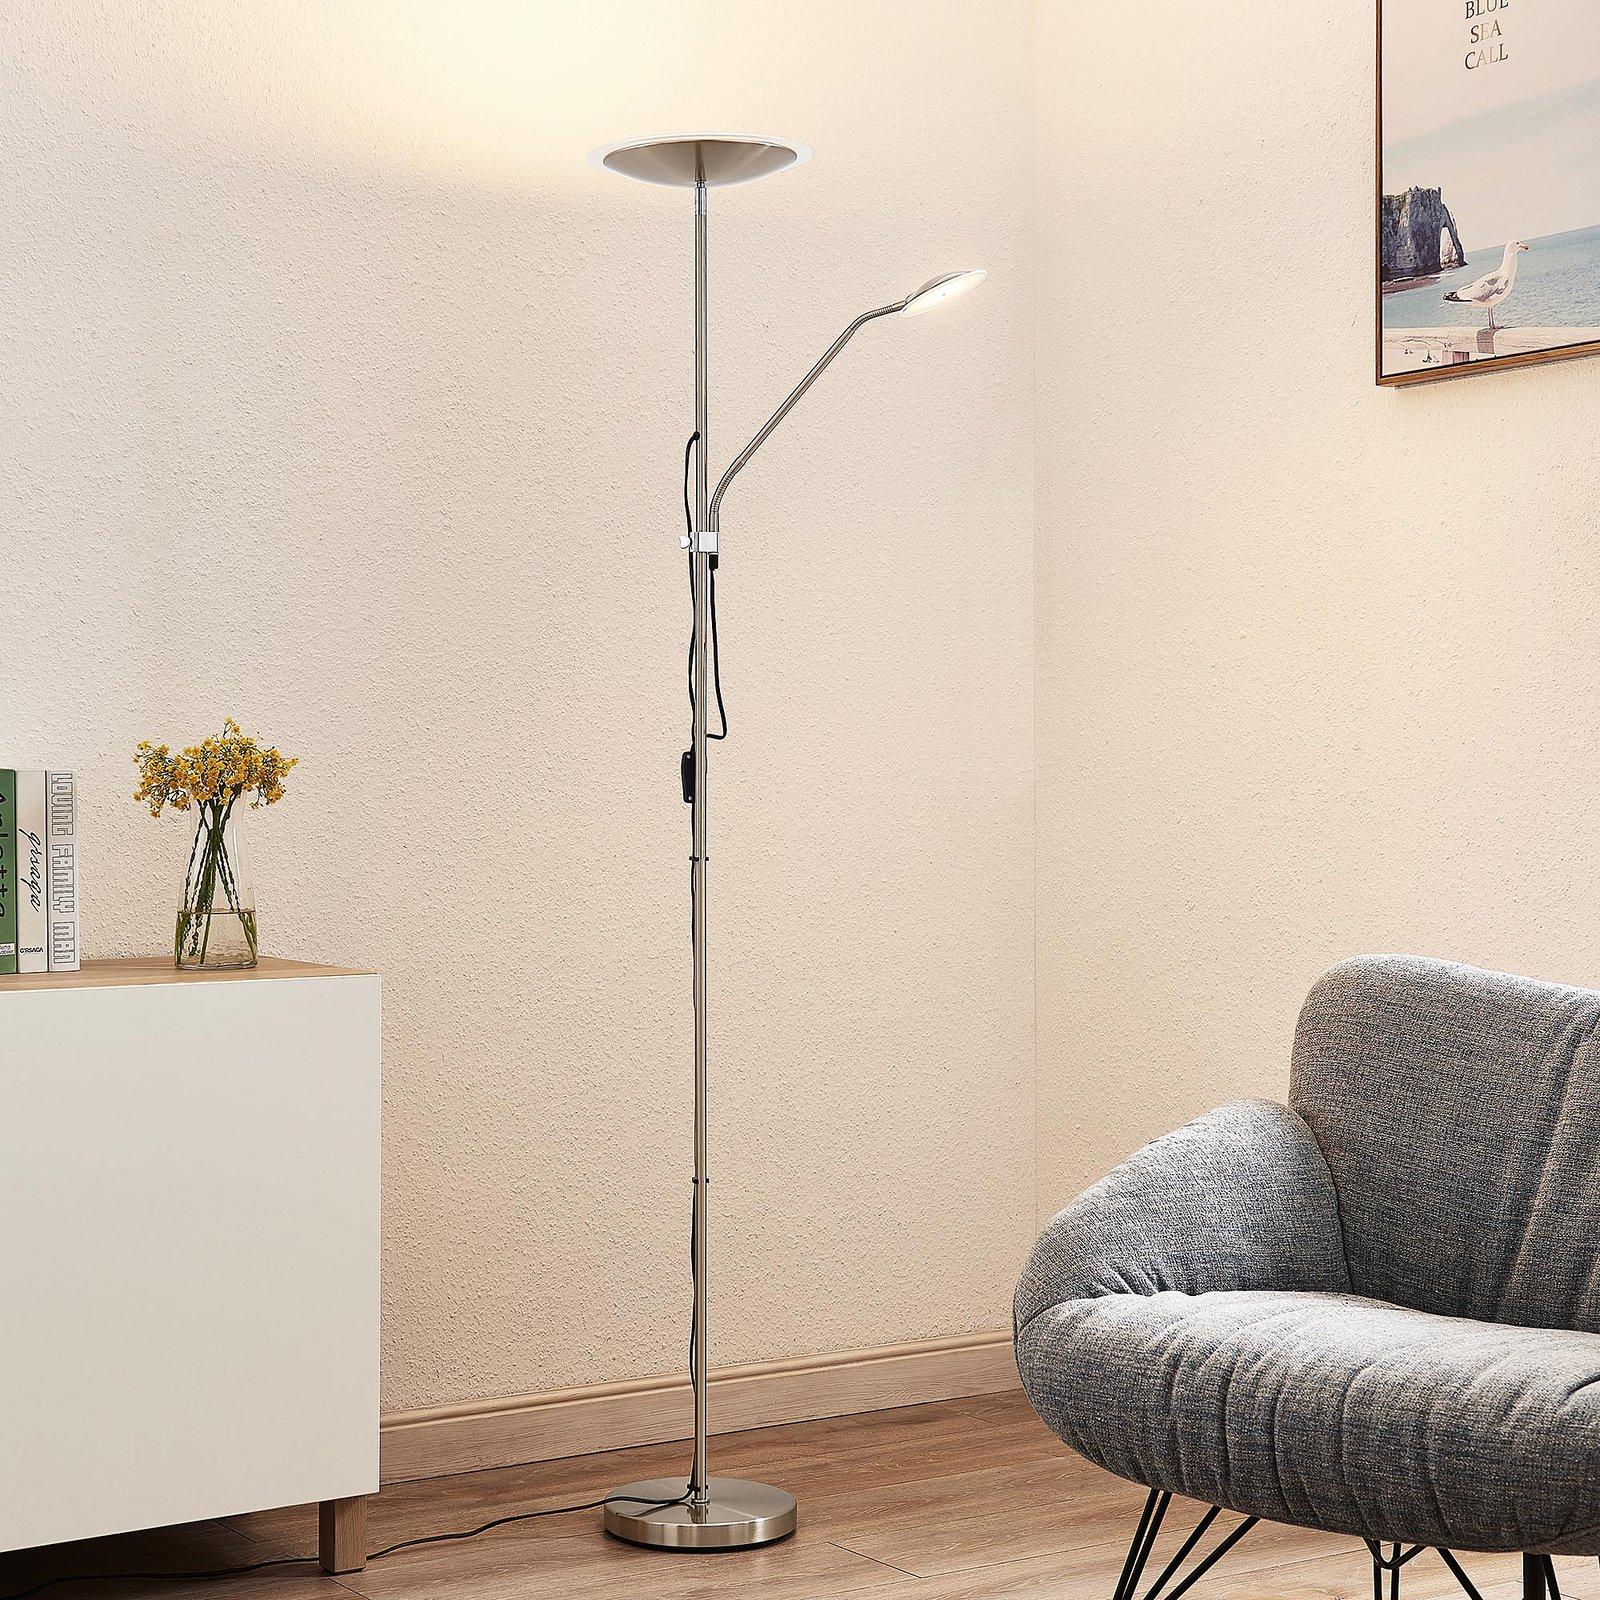 Lindby Heliani LED-gulvlampe, 2 lyskilder, krom